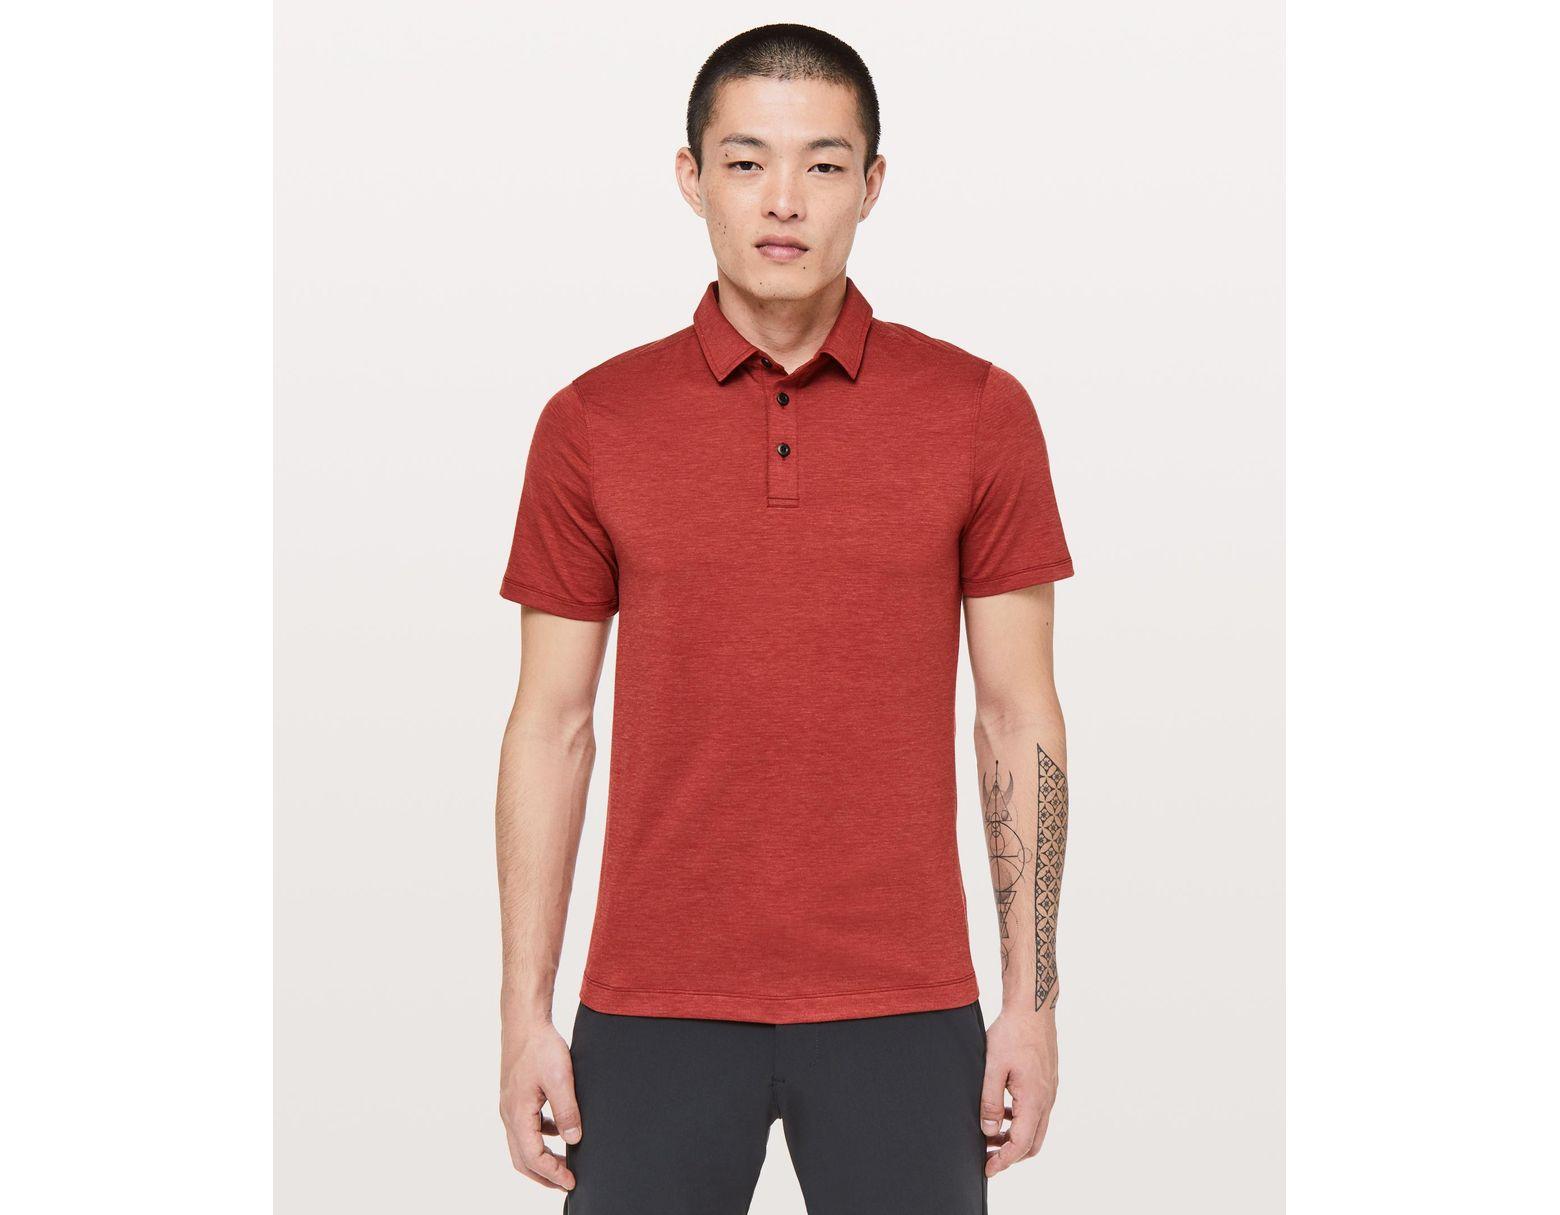 b463e5090 lululemon athletica Evolution Polo in Red for Men - Save 22% - Lyst